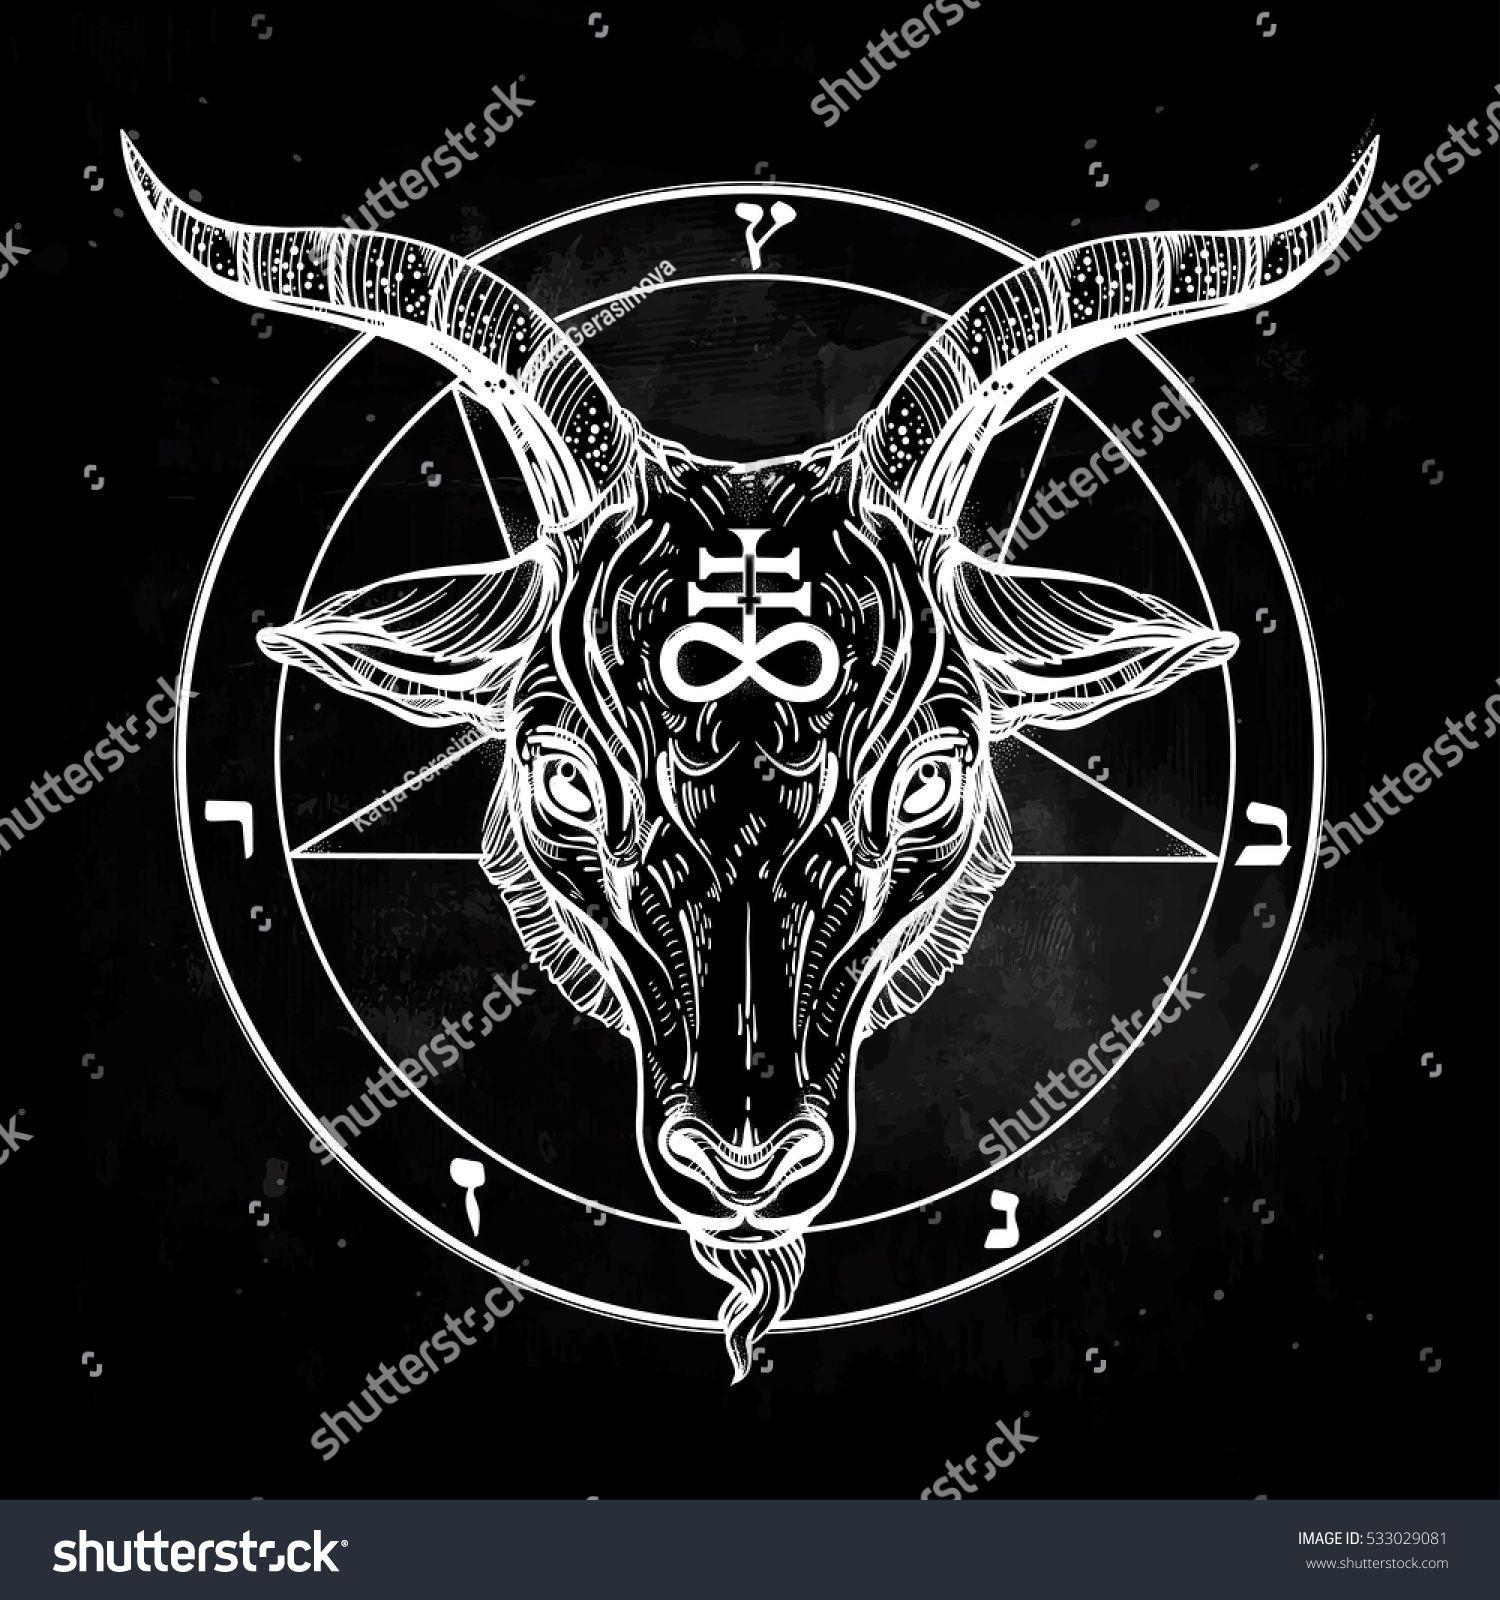 Satanic Cat Design CATAN 666 666 T Satan Cats And Art